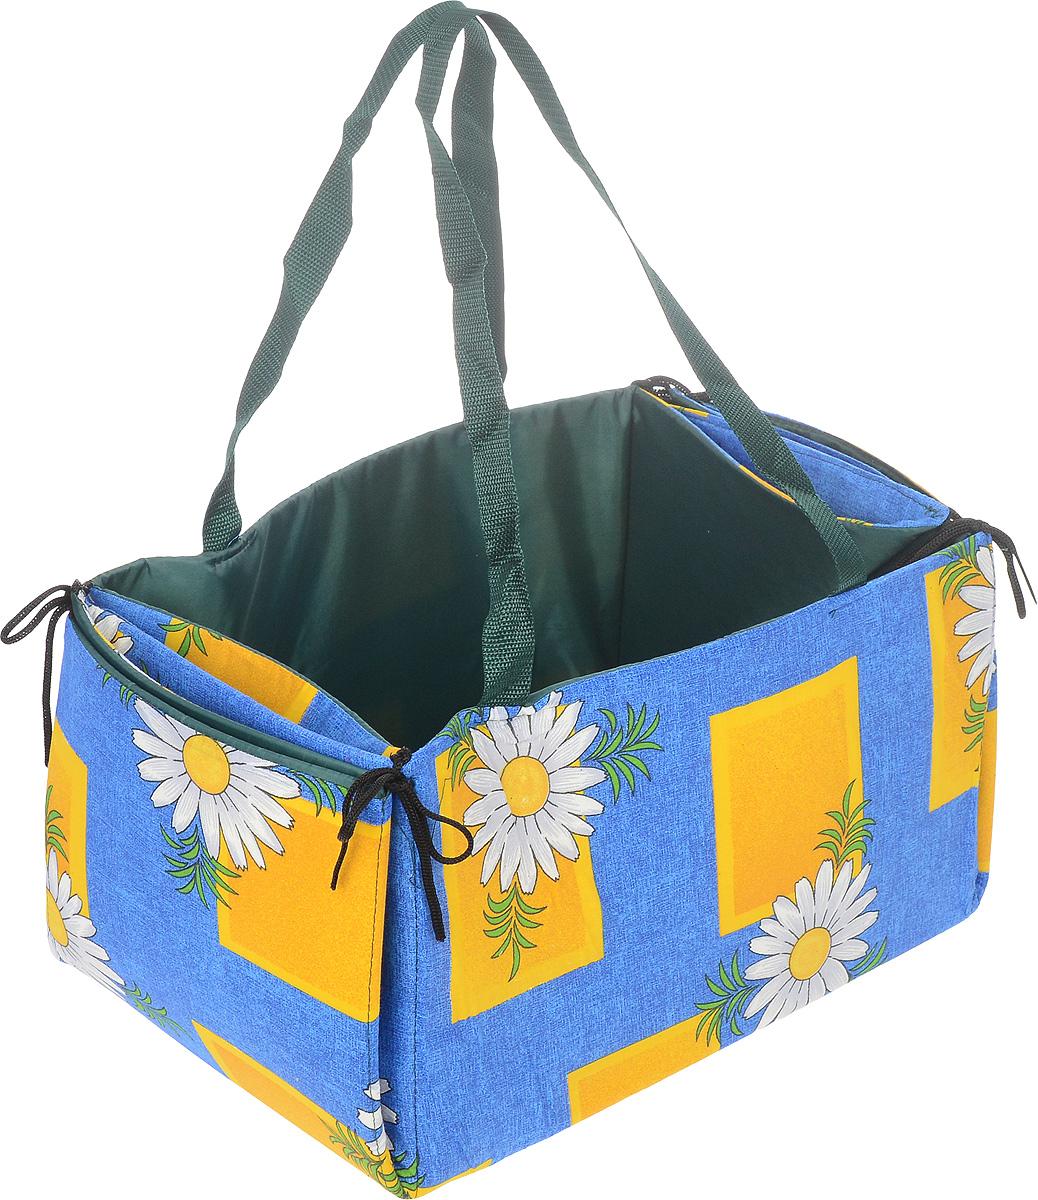 "Коврик для пикника Eva ""Лукошко"", цвет: синий, желтый, 70 х 87 см"